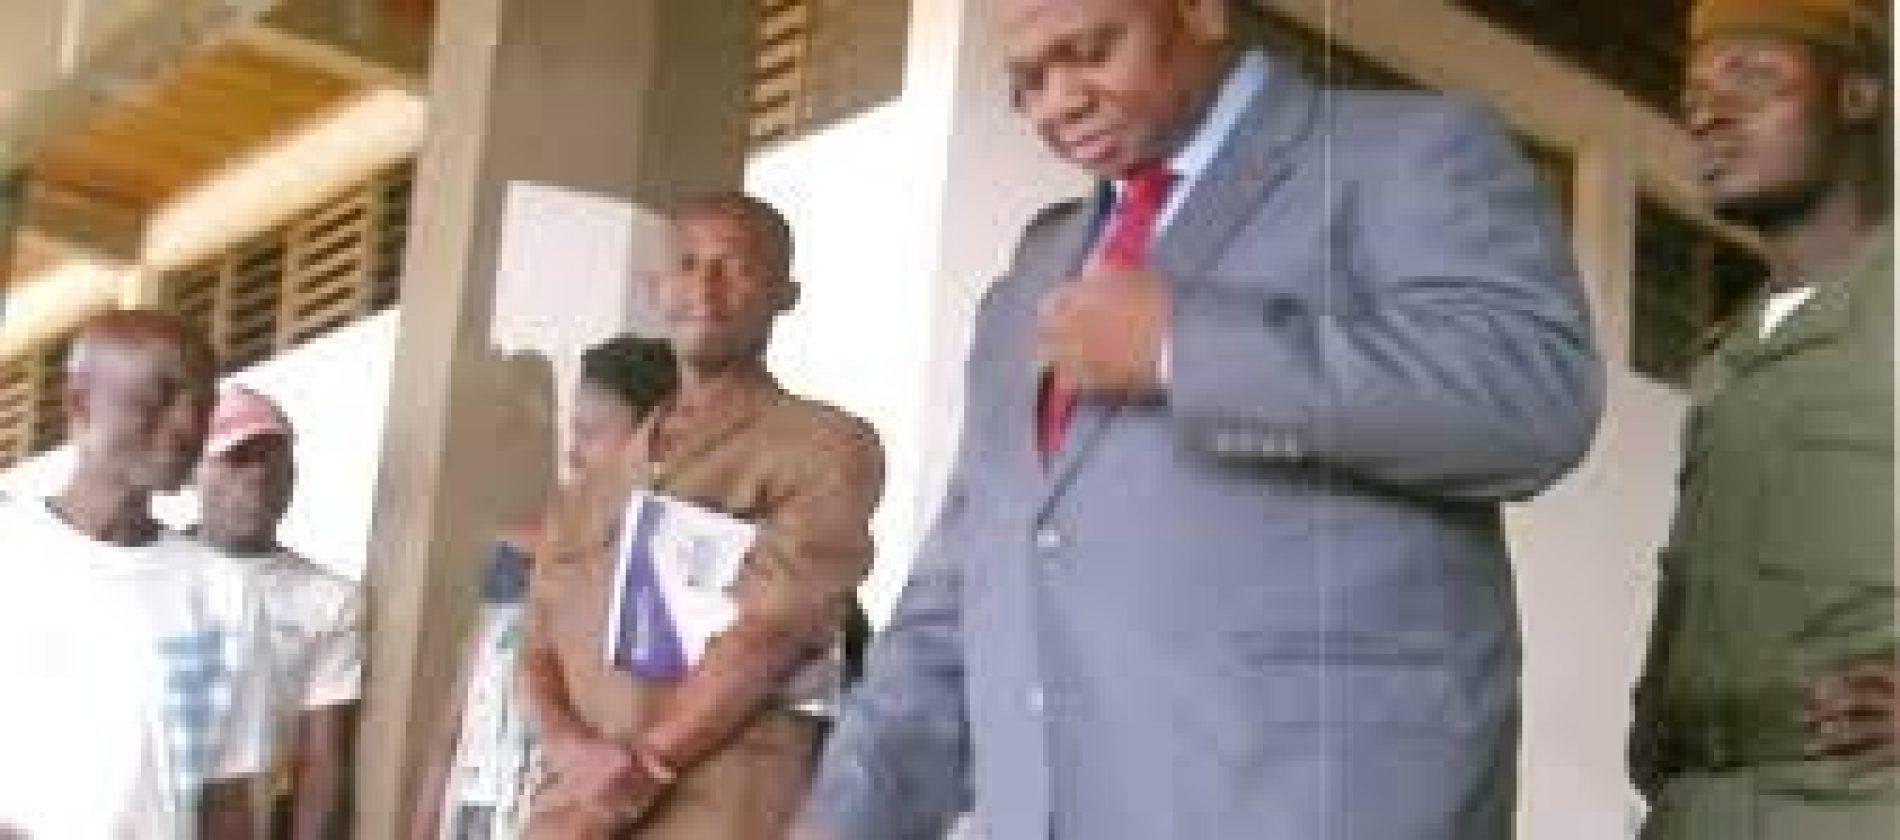 Yokadouma: L'ex-maire Paulin Abono Moampamb respire enfin le vent de la liberté